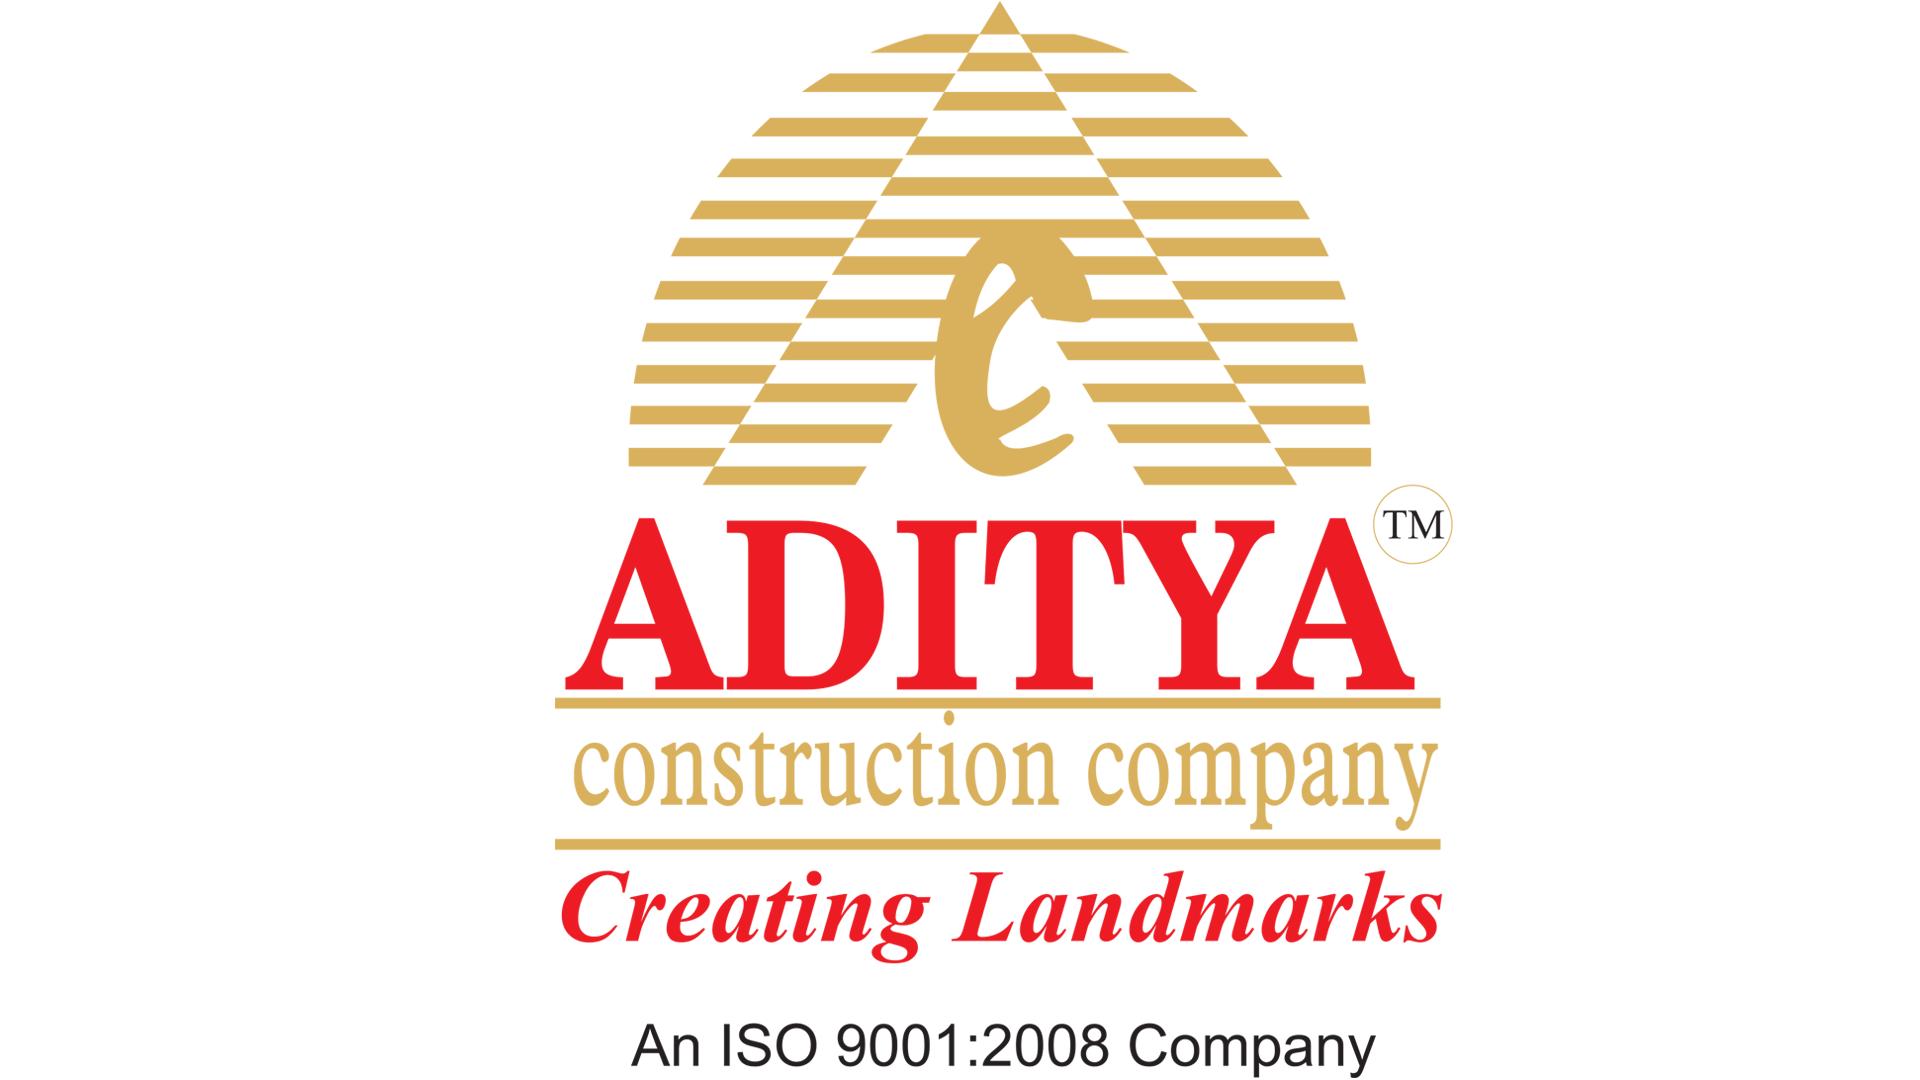 Premium Builders in Hyderabad | Luxury 3BHK Apartments in